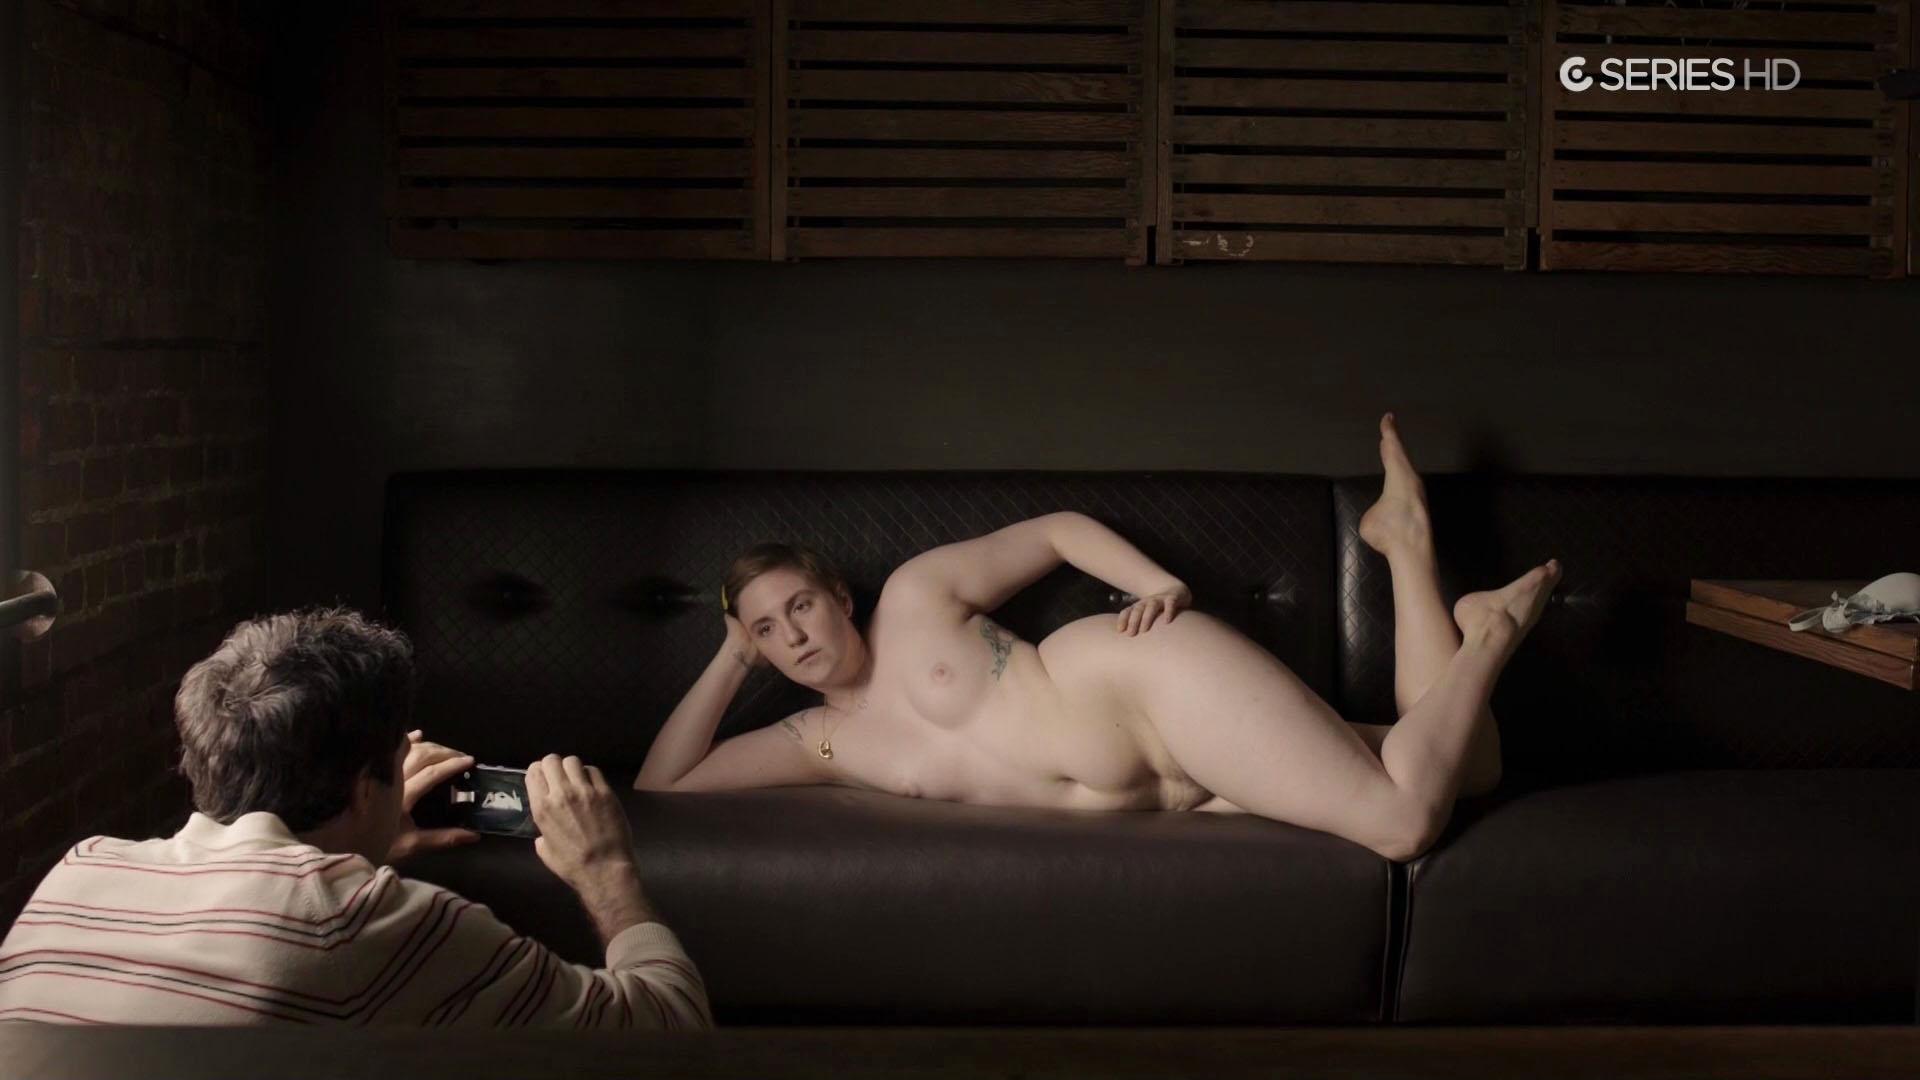 XXX Lena Dunham nudes (23 photos), Topless, Fappening, Feet, cleavage 2019